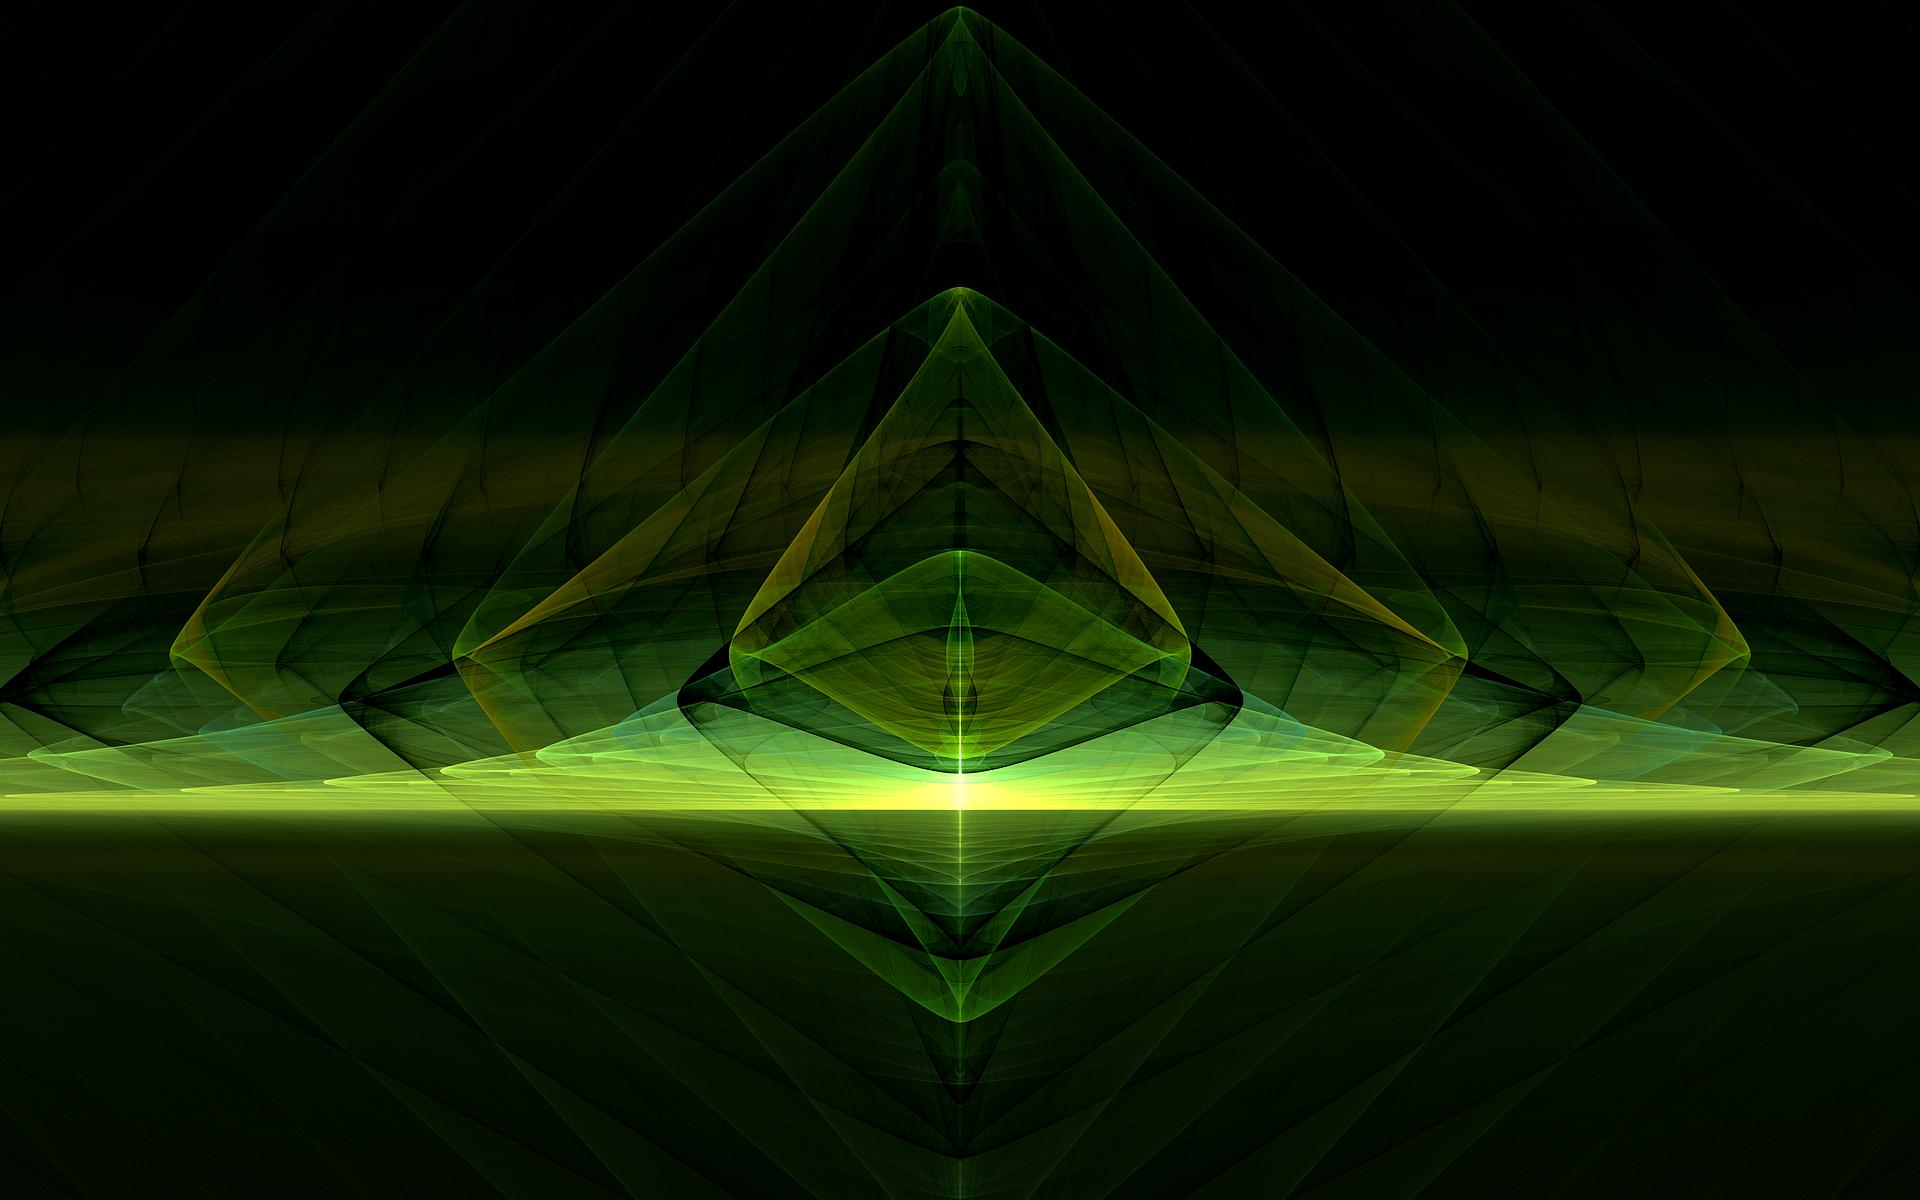 Abstract - Fractal  Green Lines Light Wallpaper